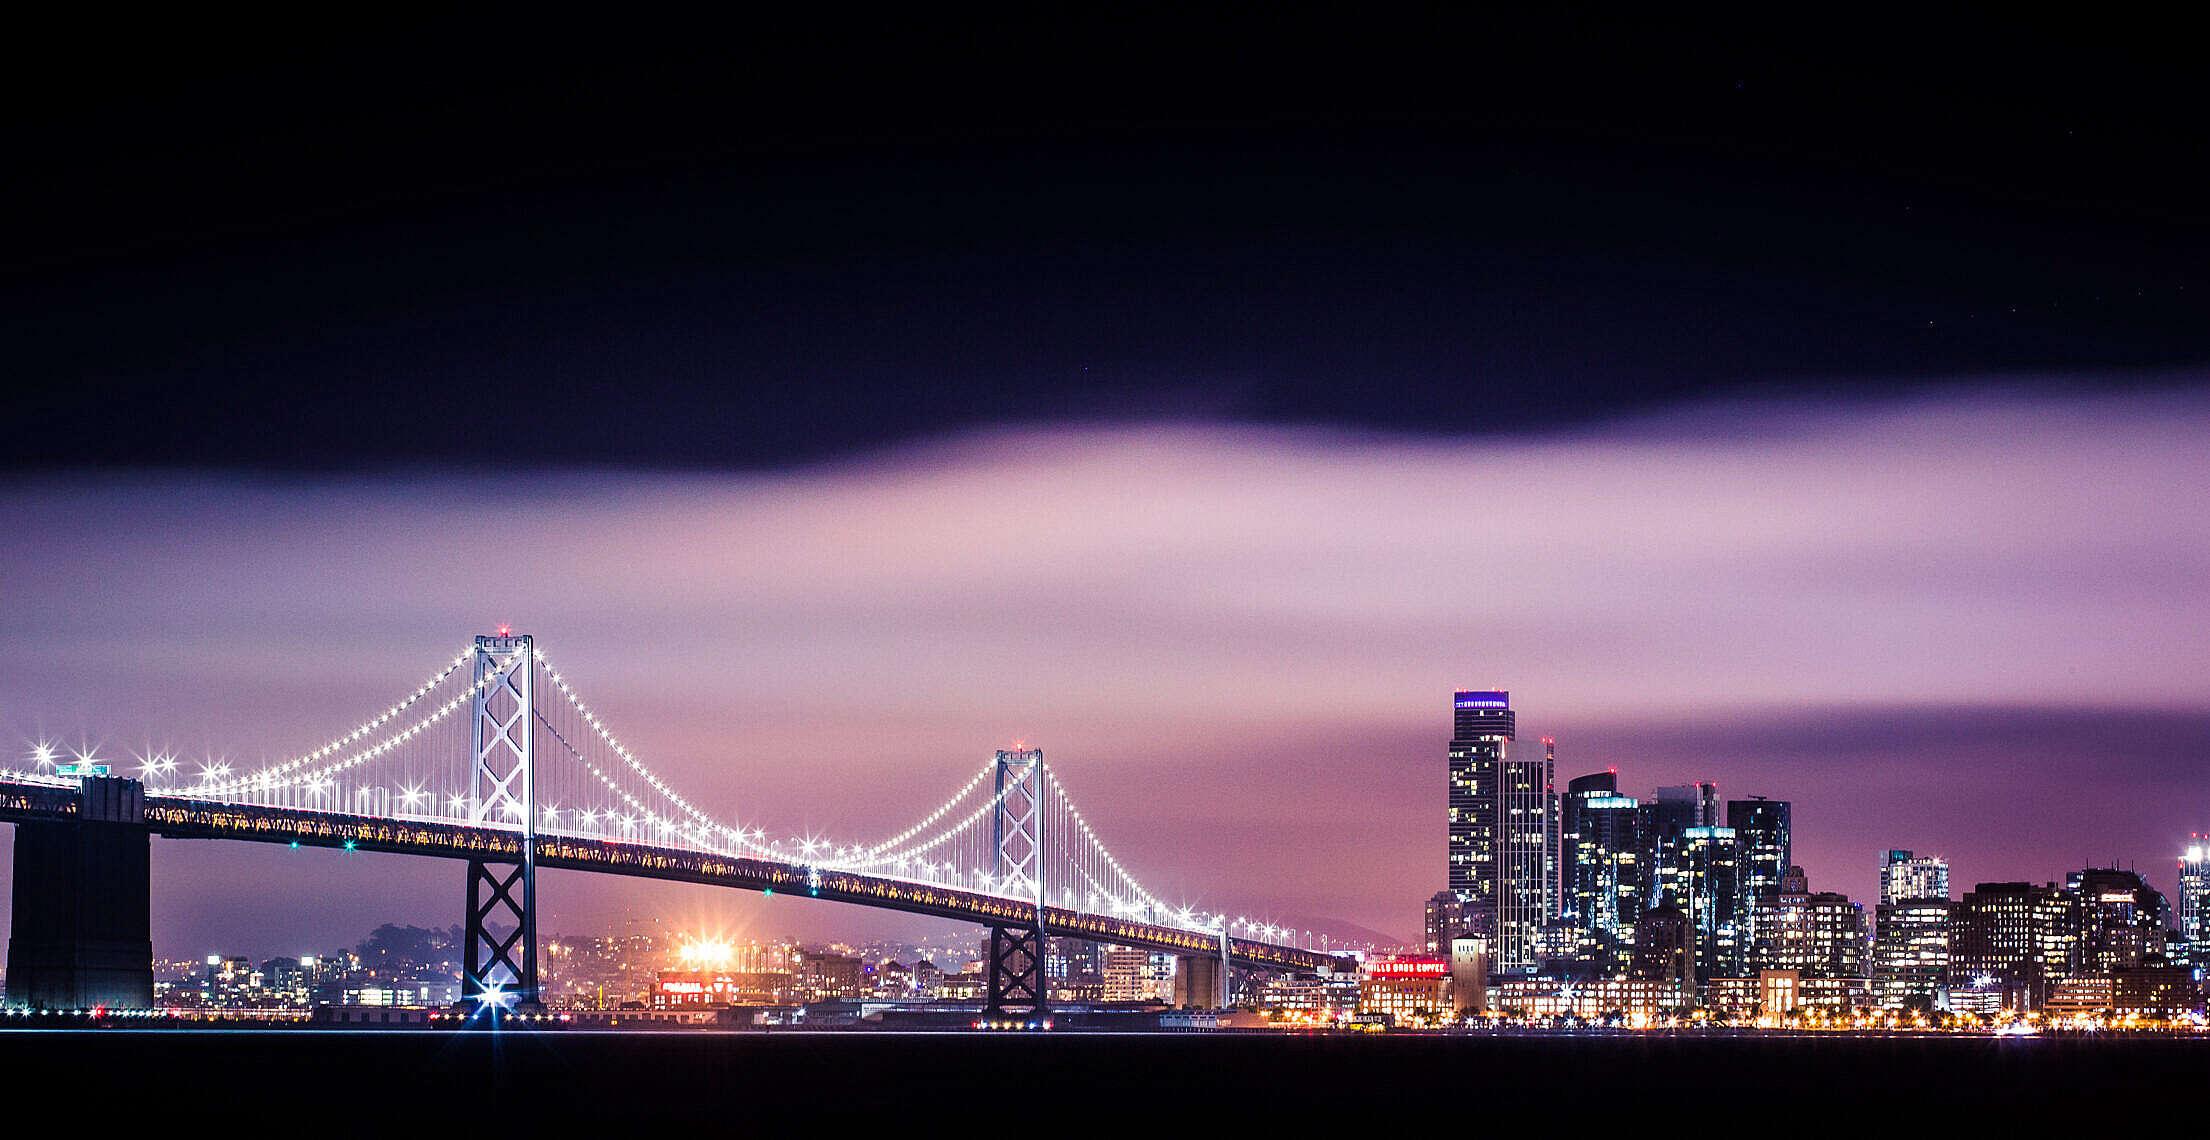 Bay Bridge with San Francisco Skyscrapers Cityscape at Night Free Stock Photo